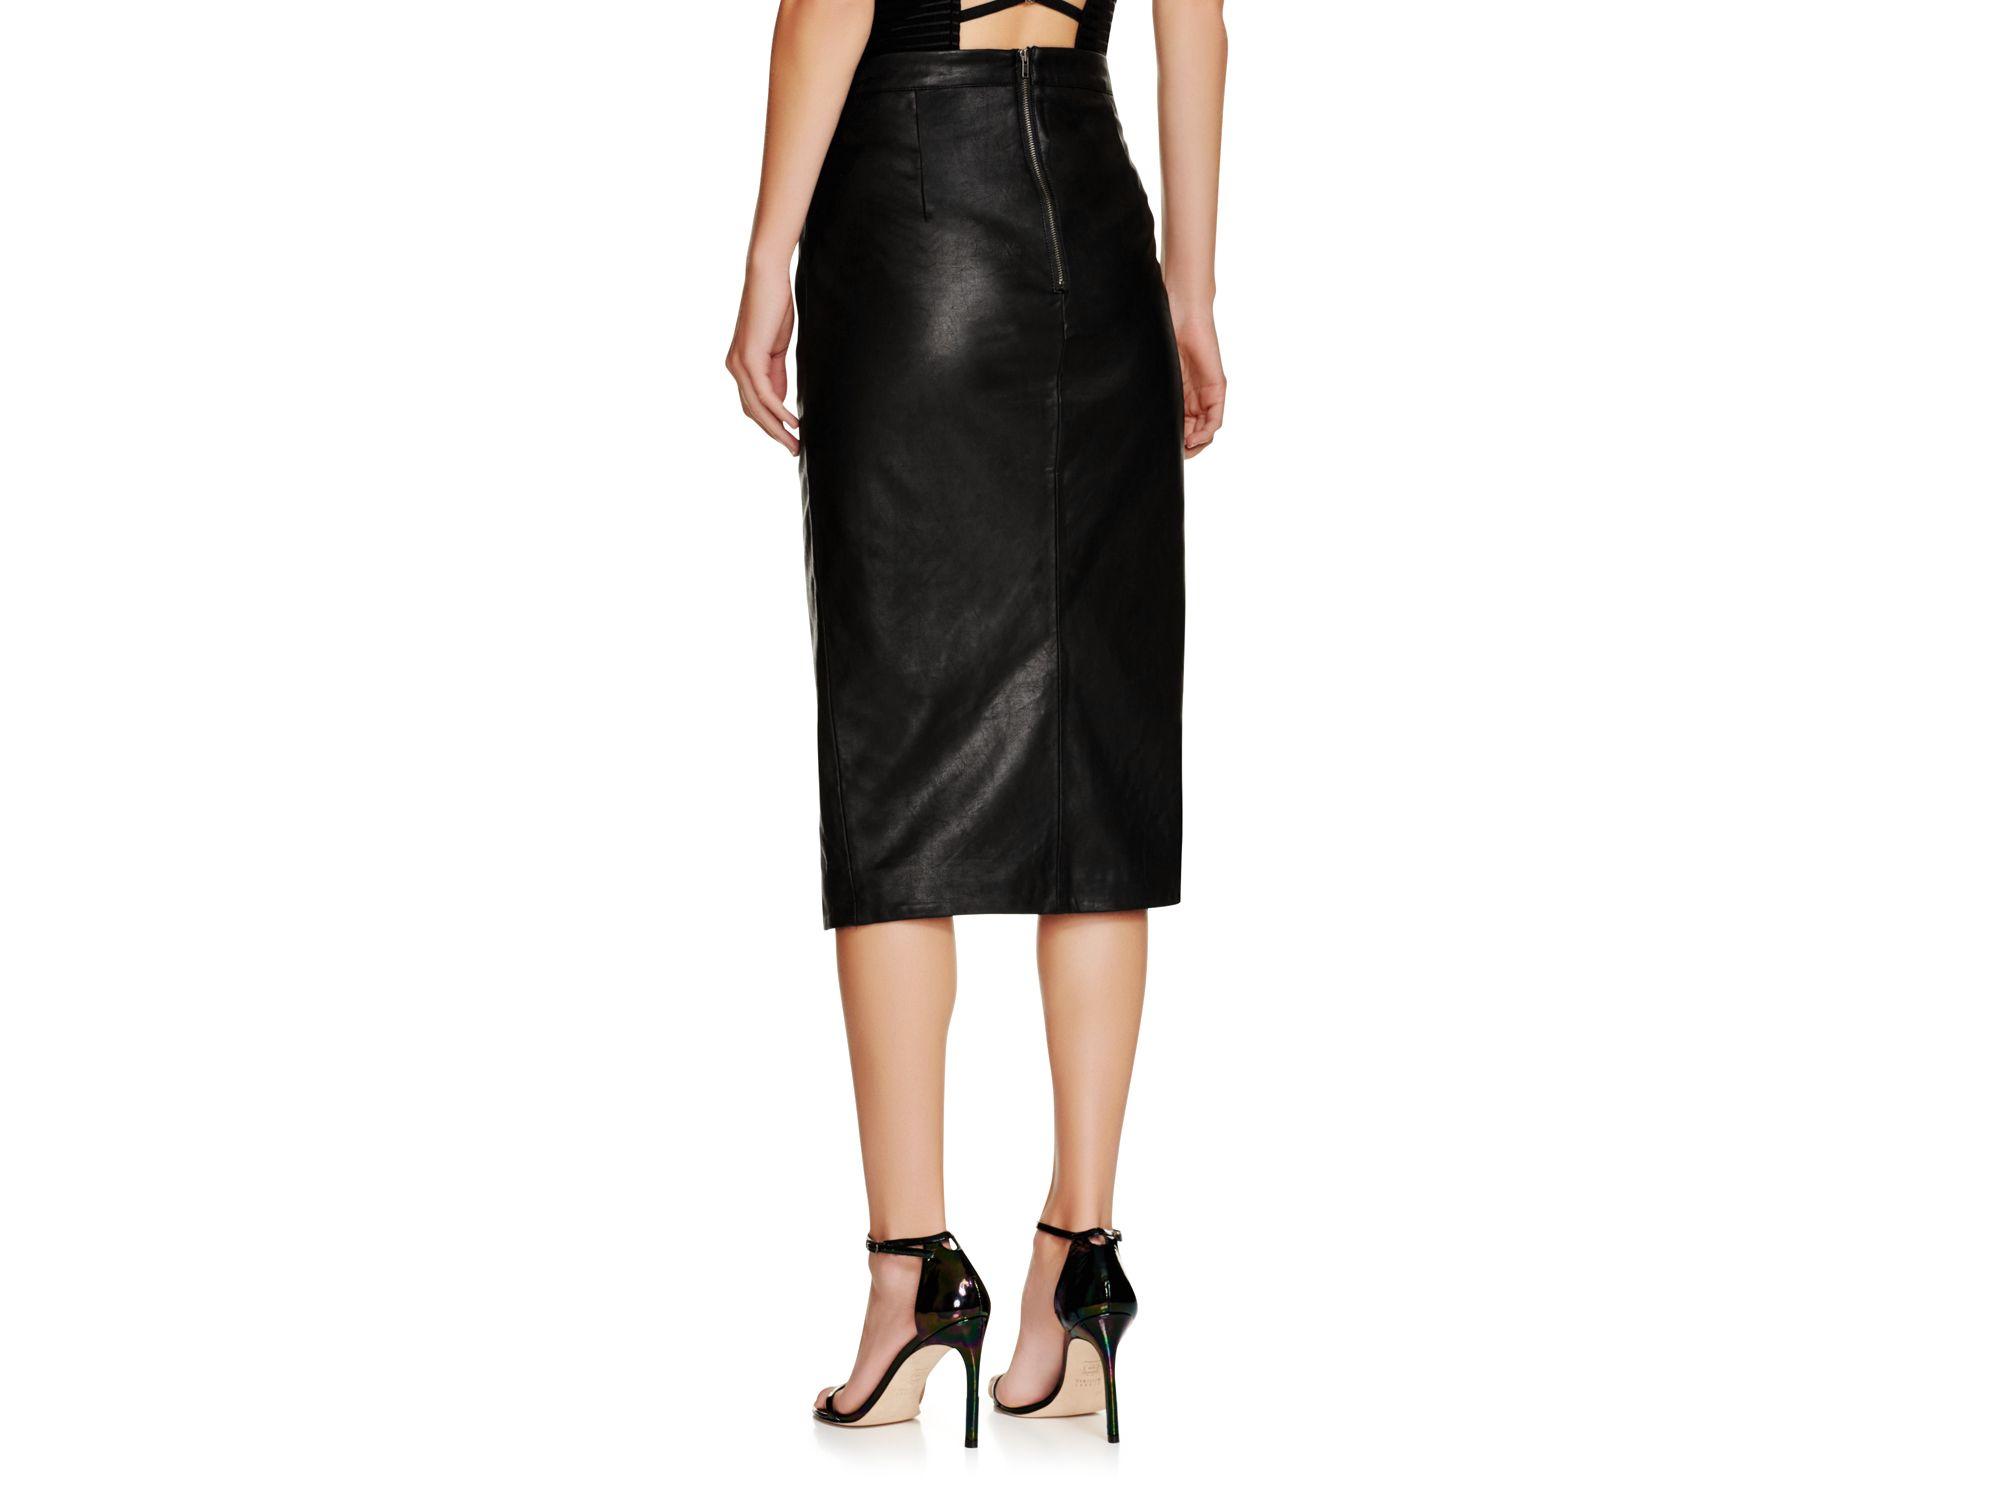 bardot faux leather side slit pencil skirt in black lyst